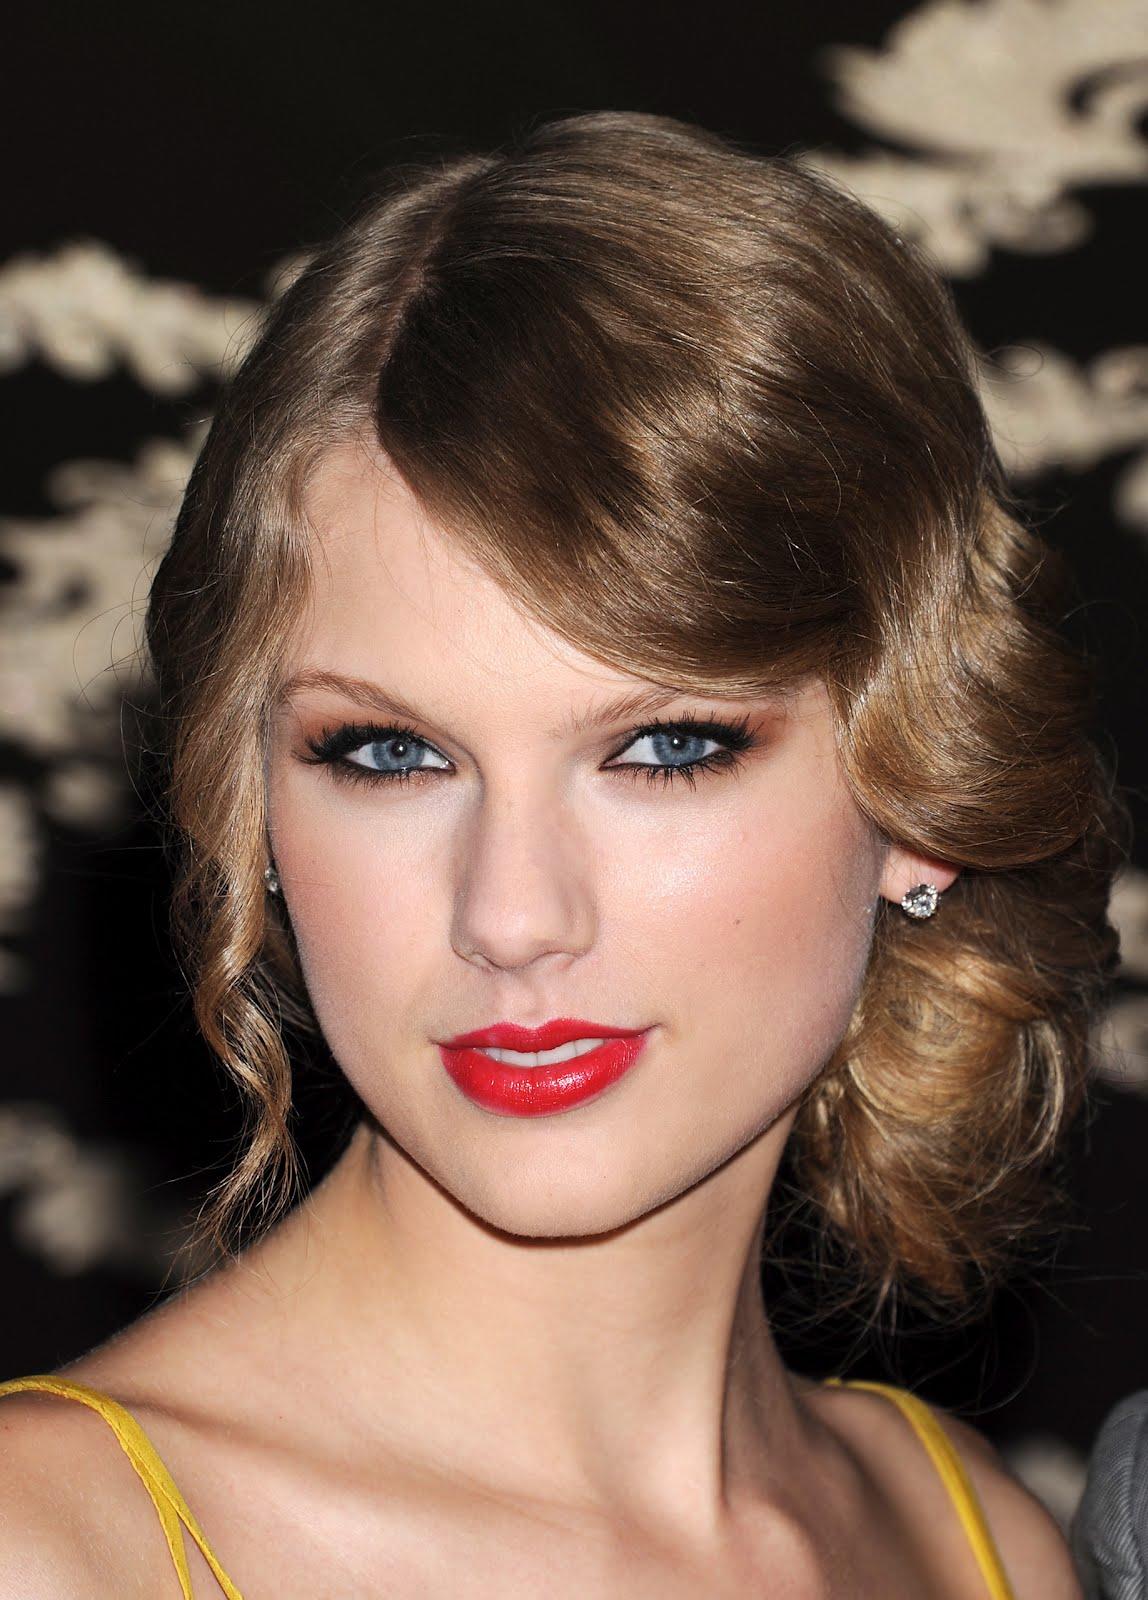 Taylor Swift In Vogue Magazine Australia November 2015: Beauty Models Images: Taylor Swift